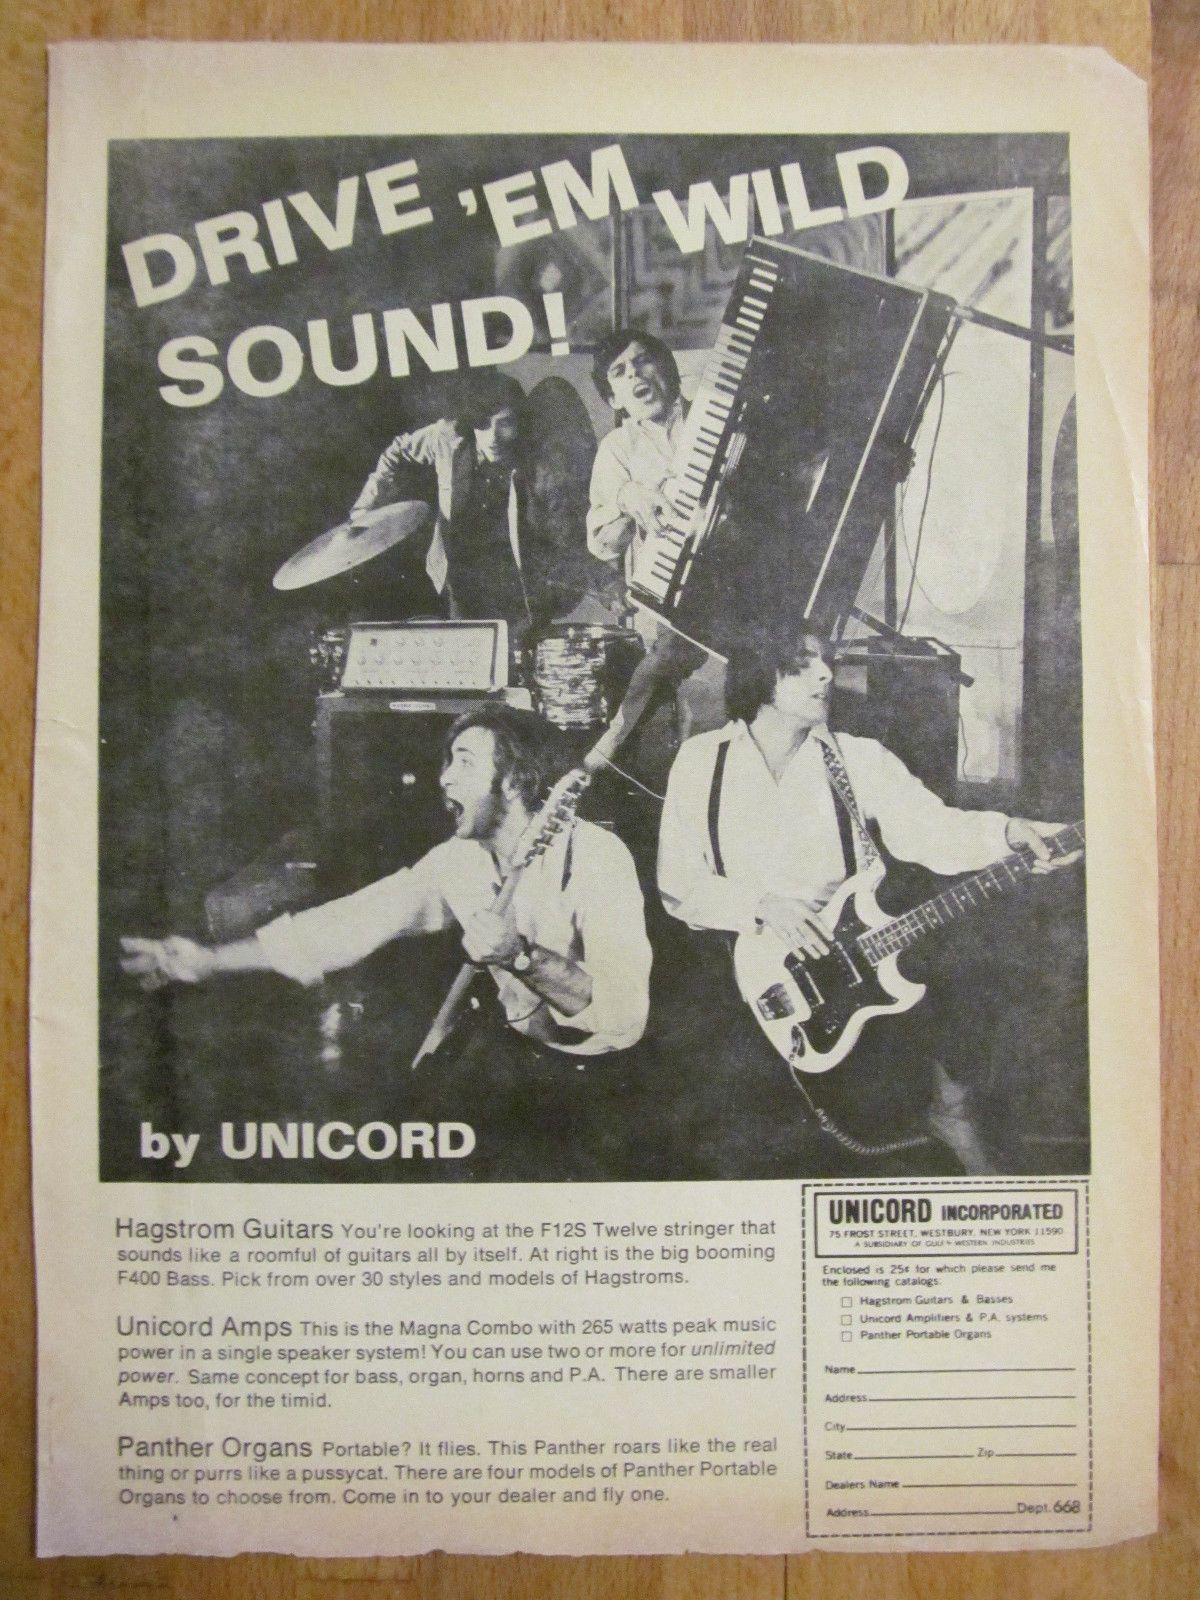 Unicord Music Equipment Full Page Vintage Ad 1960'S | eBay